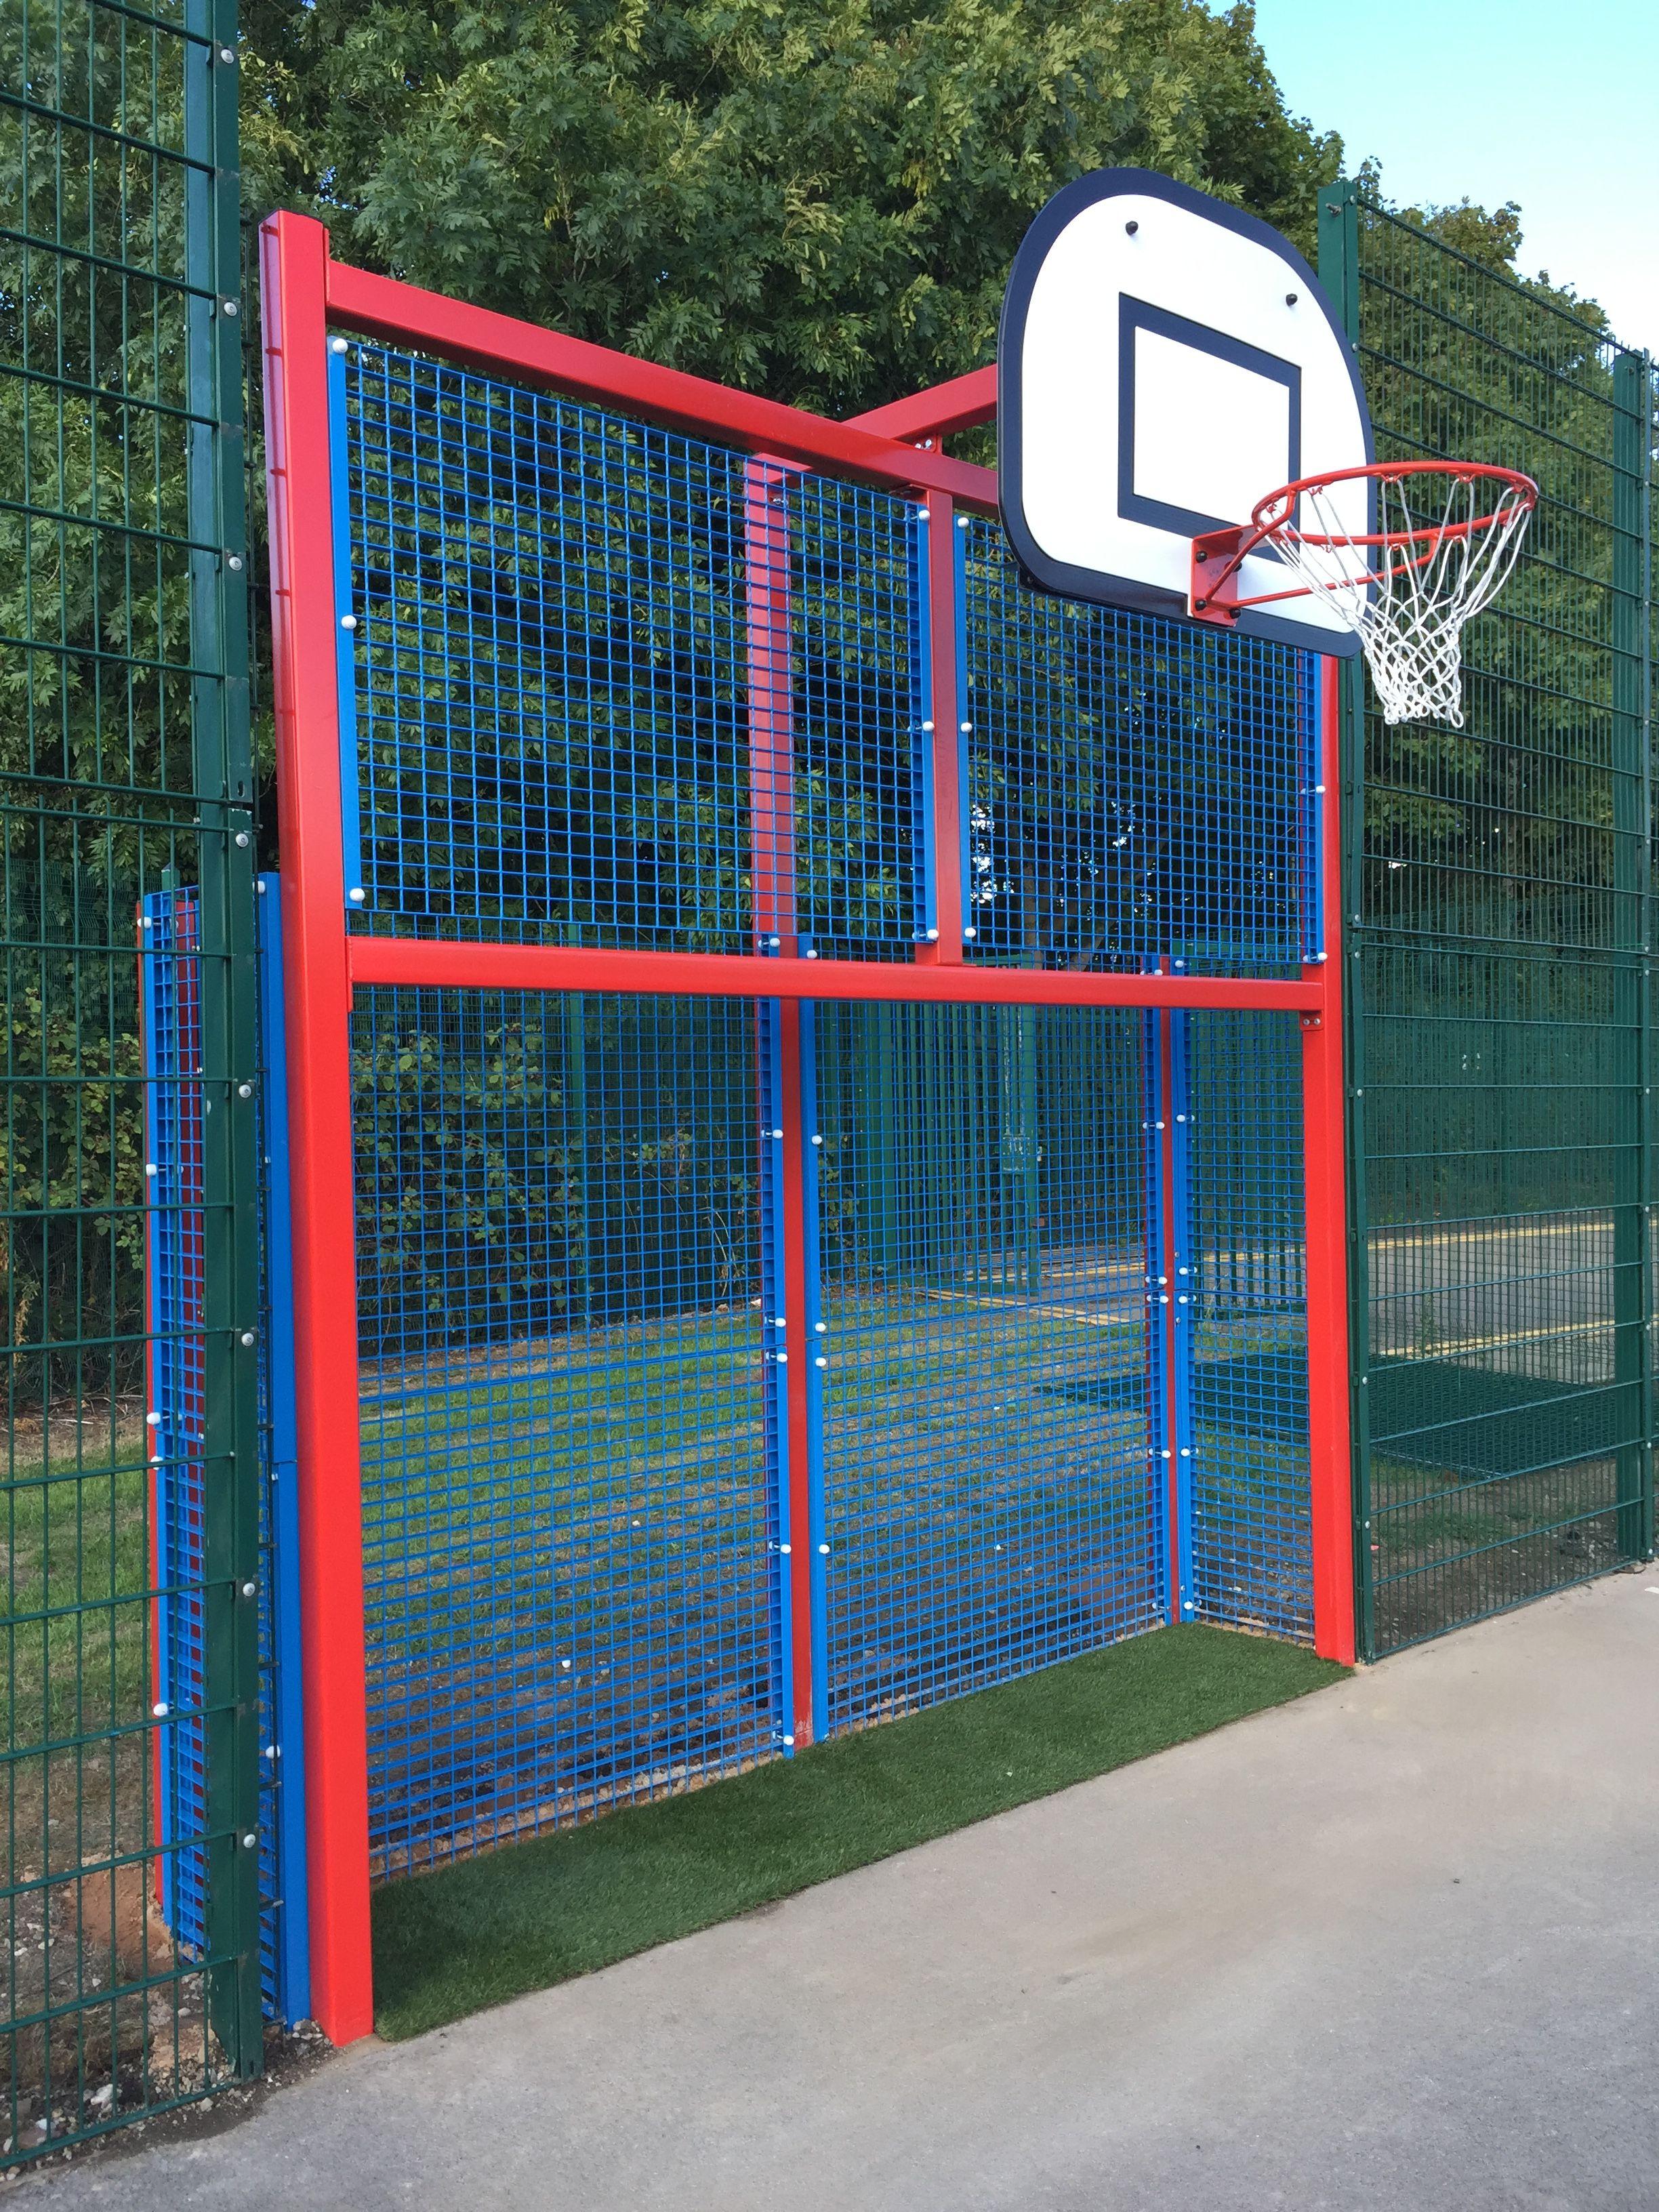 Playground Goal Unit Heavy Duty Goal Unit Football Goal Basketball Hoop Basketball Hoop Football Goal Posts Louisville Basketball